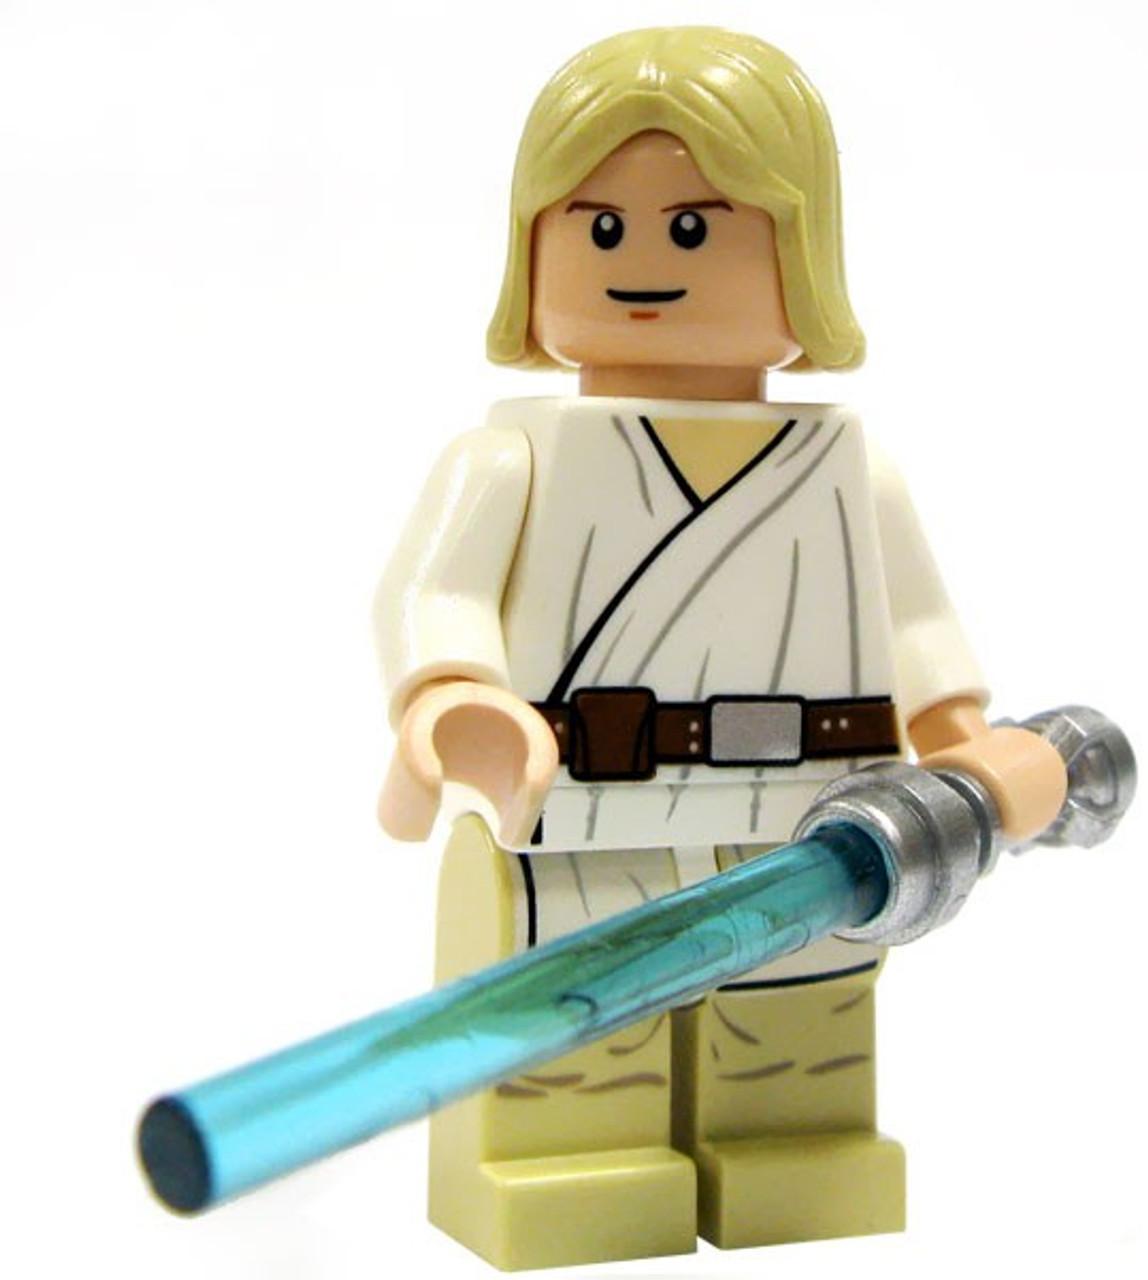 Lego Star Wars A New Hope Luke Skywalker Minifigure Tatooine Loose